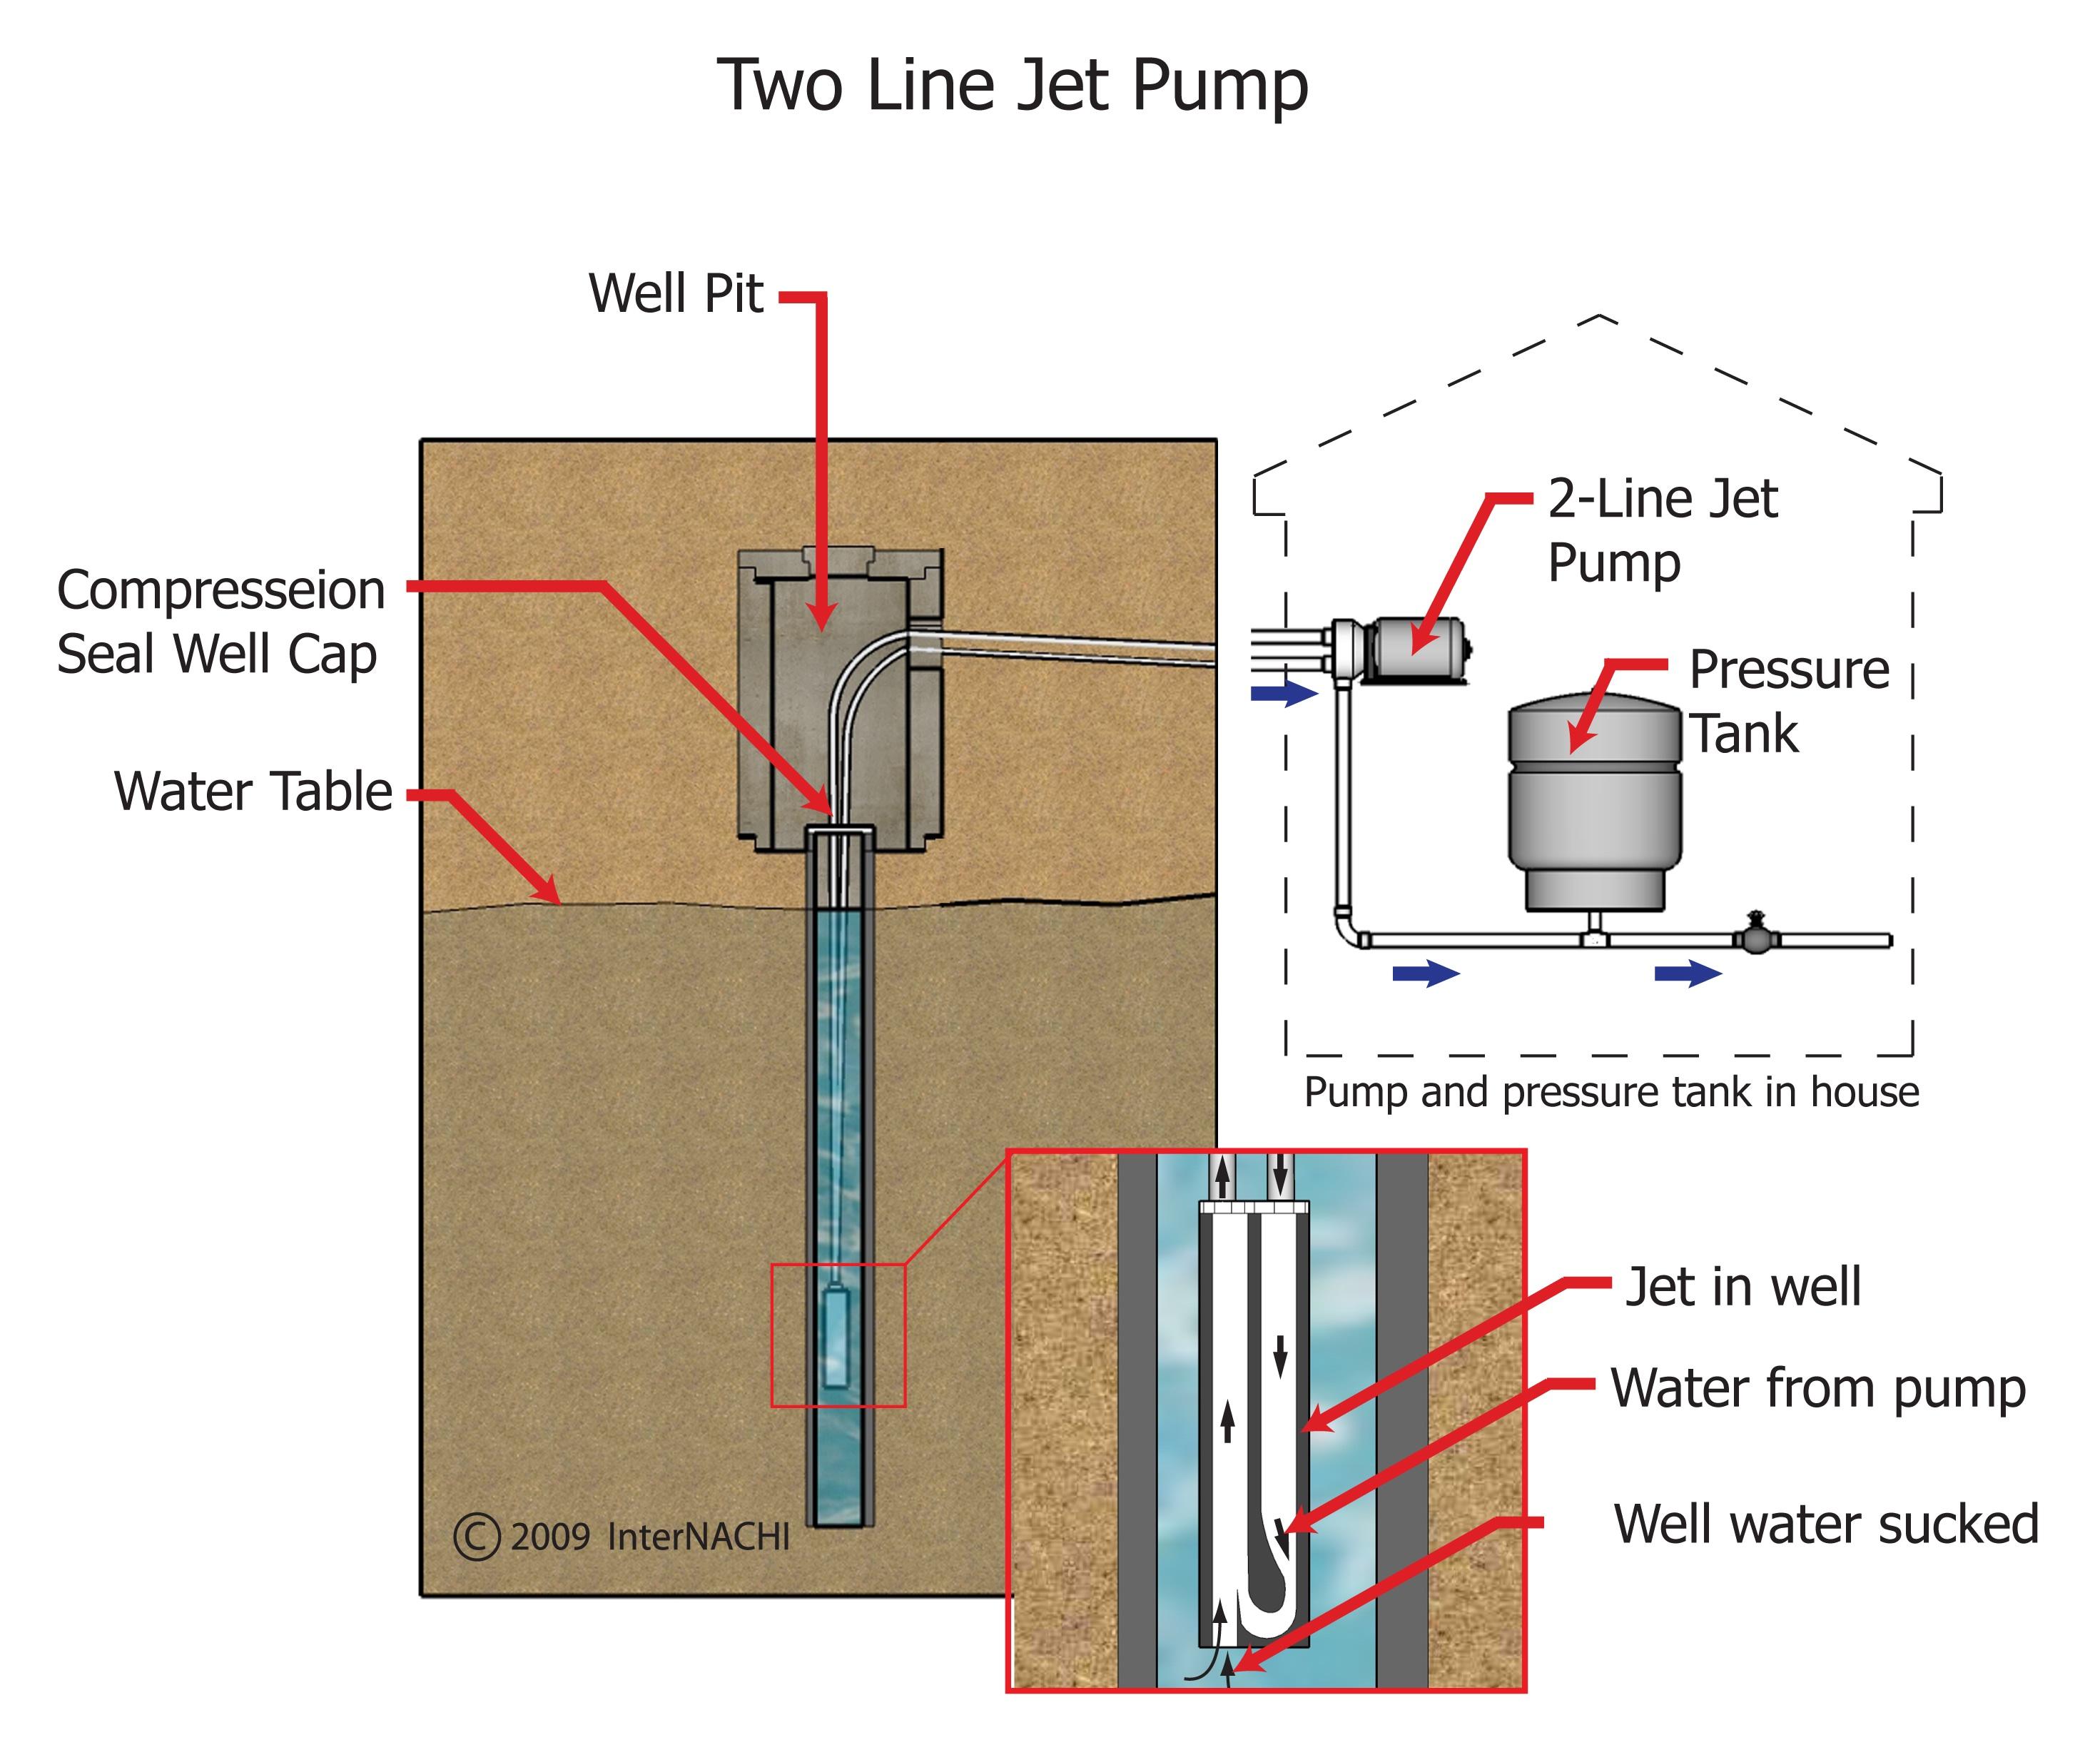 Two line jet pump.